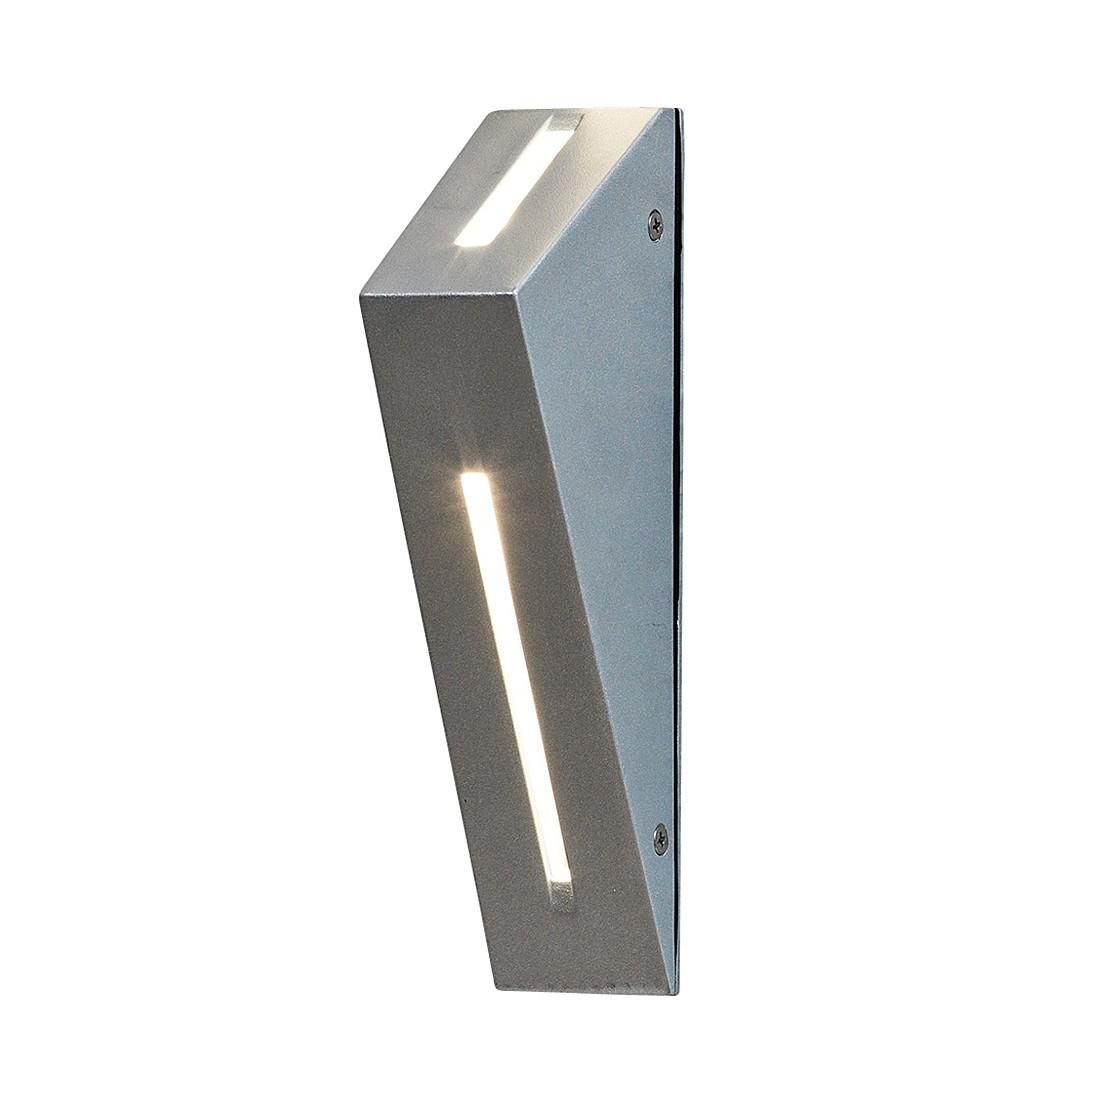 LED Wandleuchte Imola Up & Down - Aluminium/Kunststoff - 2-flammig, Konstsmide